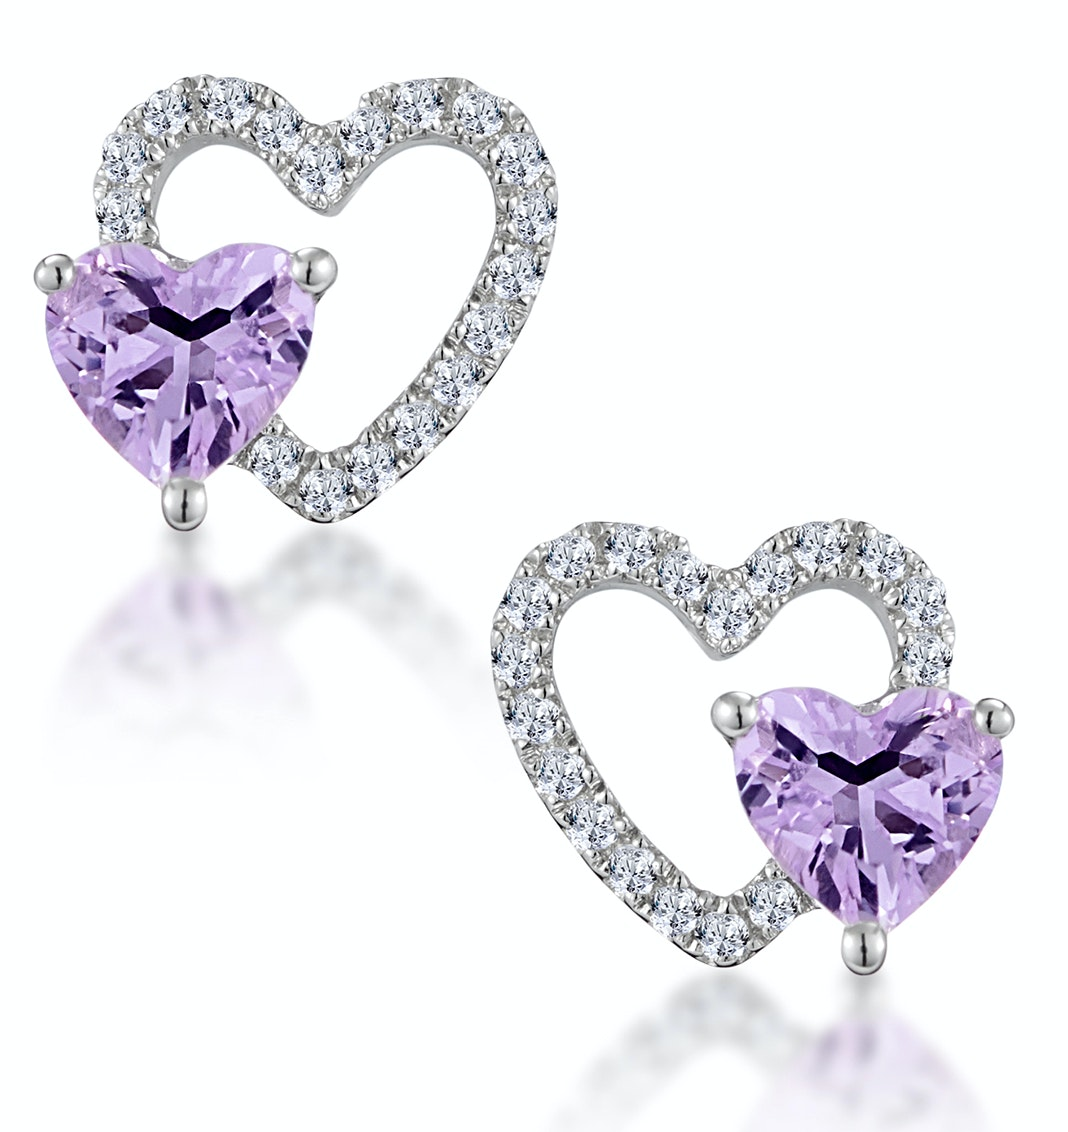 0.43ct Amethyst and Stellato Diamond Heart Earrings in 9K White Gold